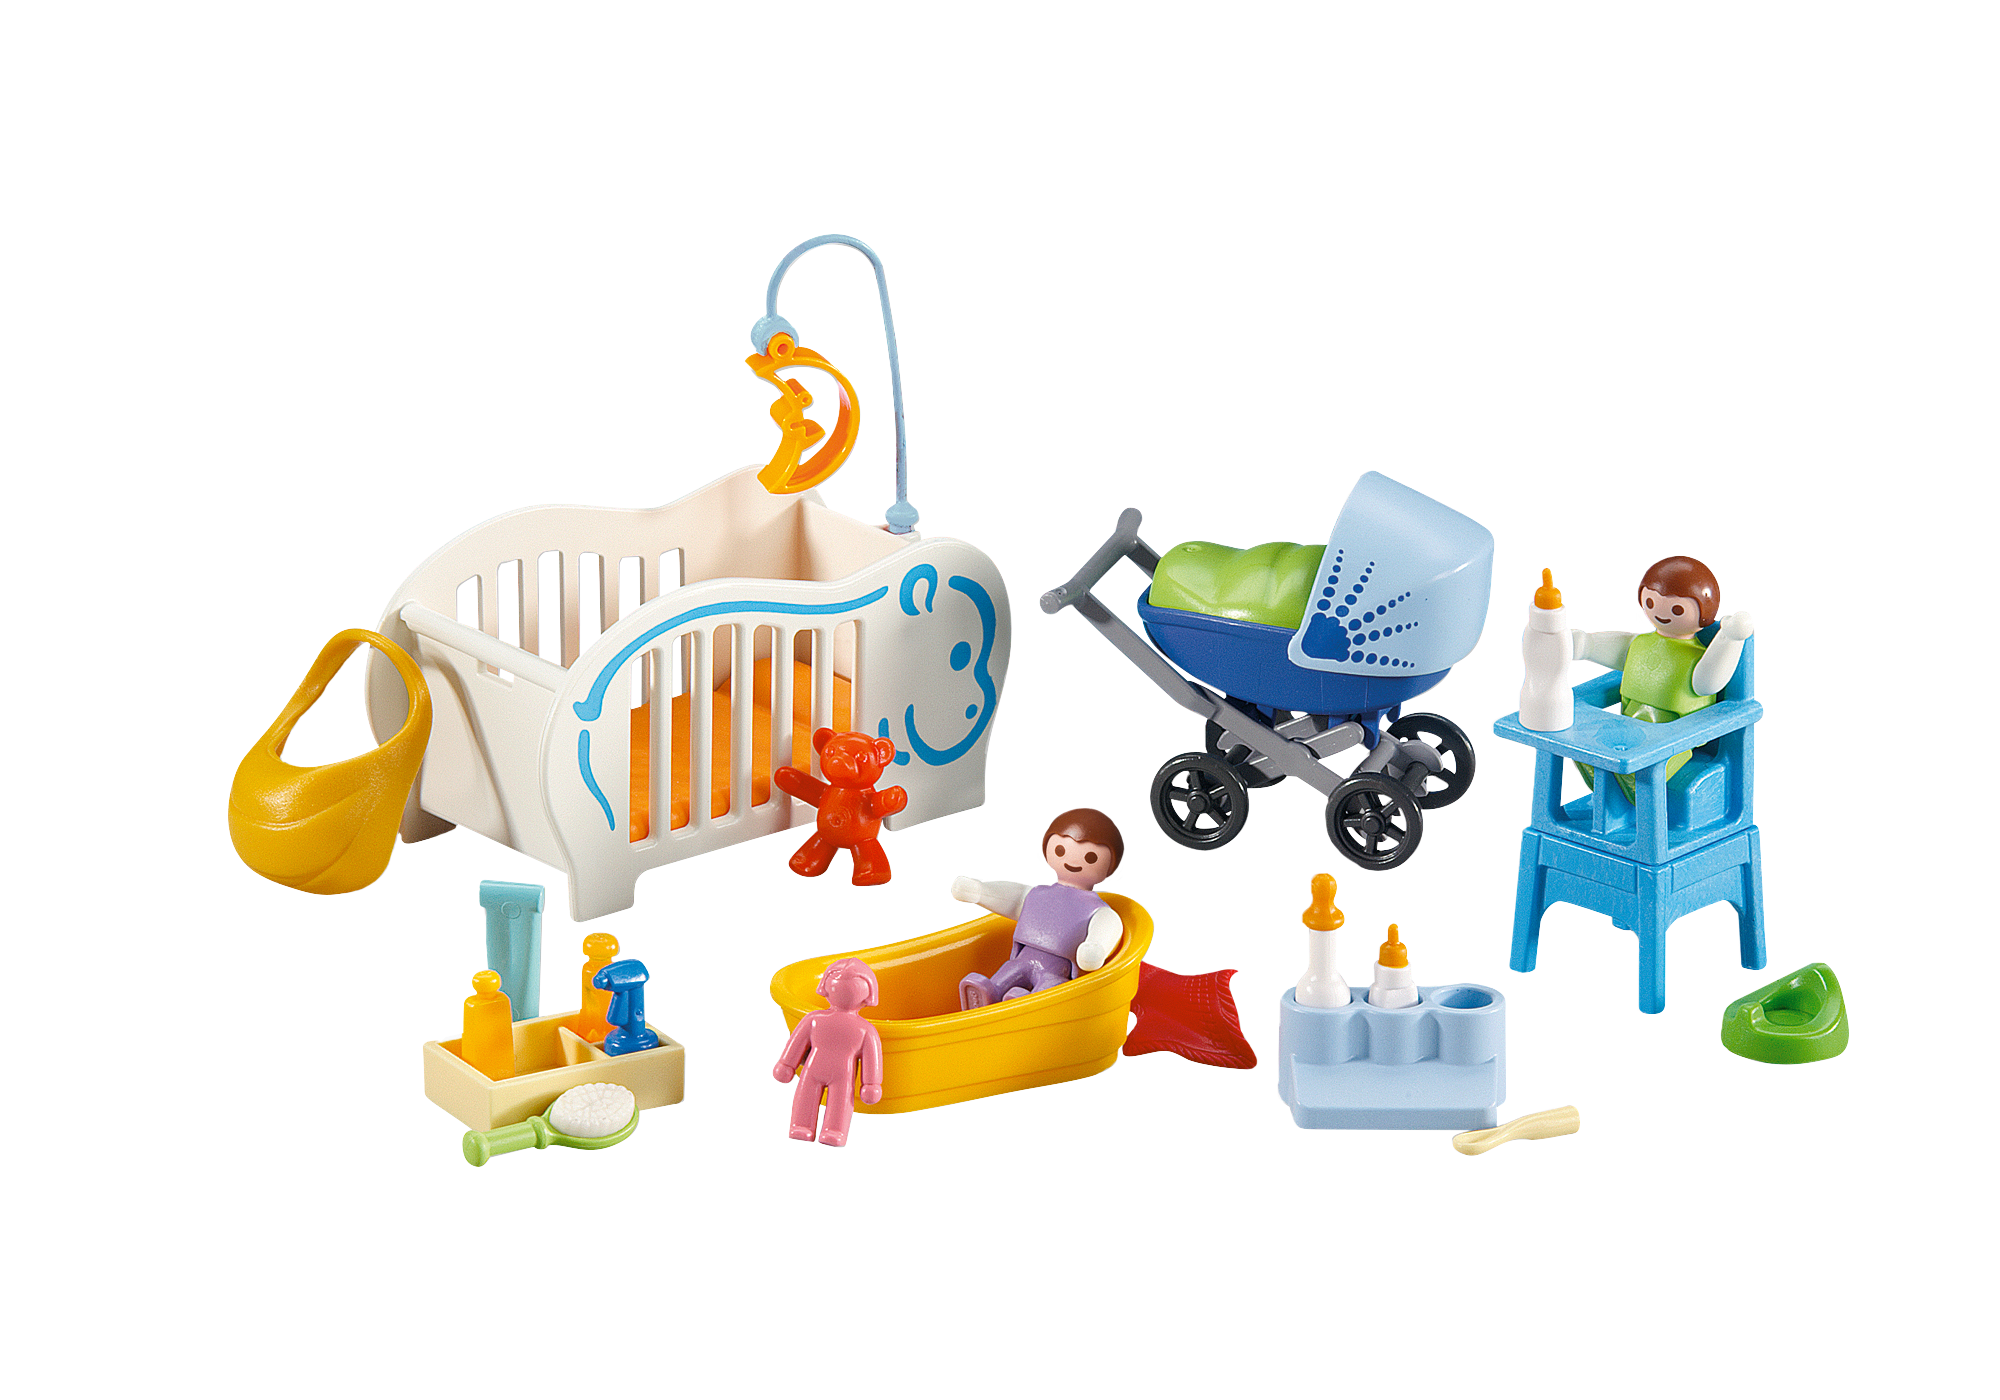 http://media.playmobil.com/i/playmobil/6226_product_detail/Babyutrustning